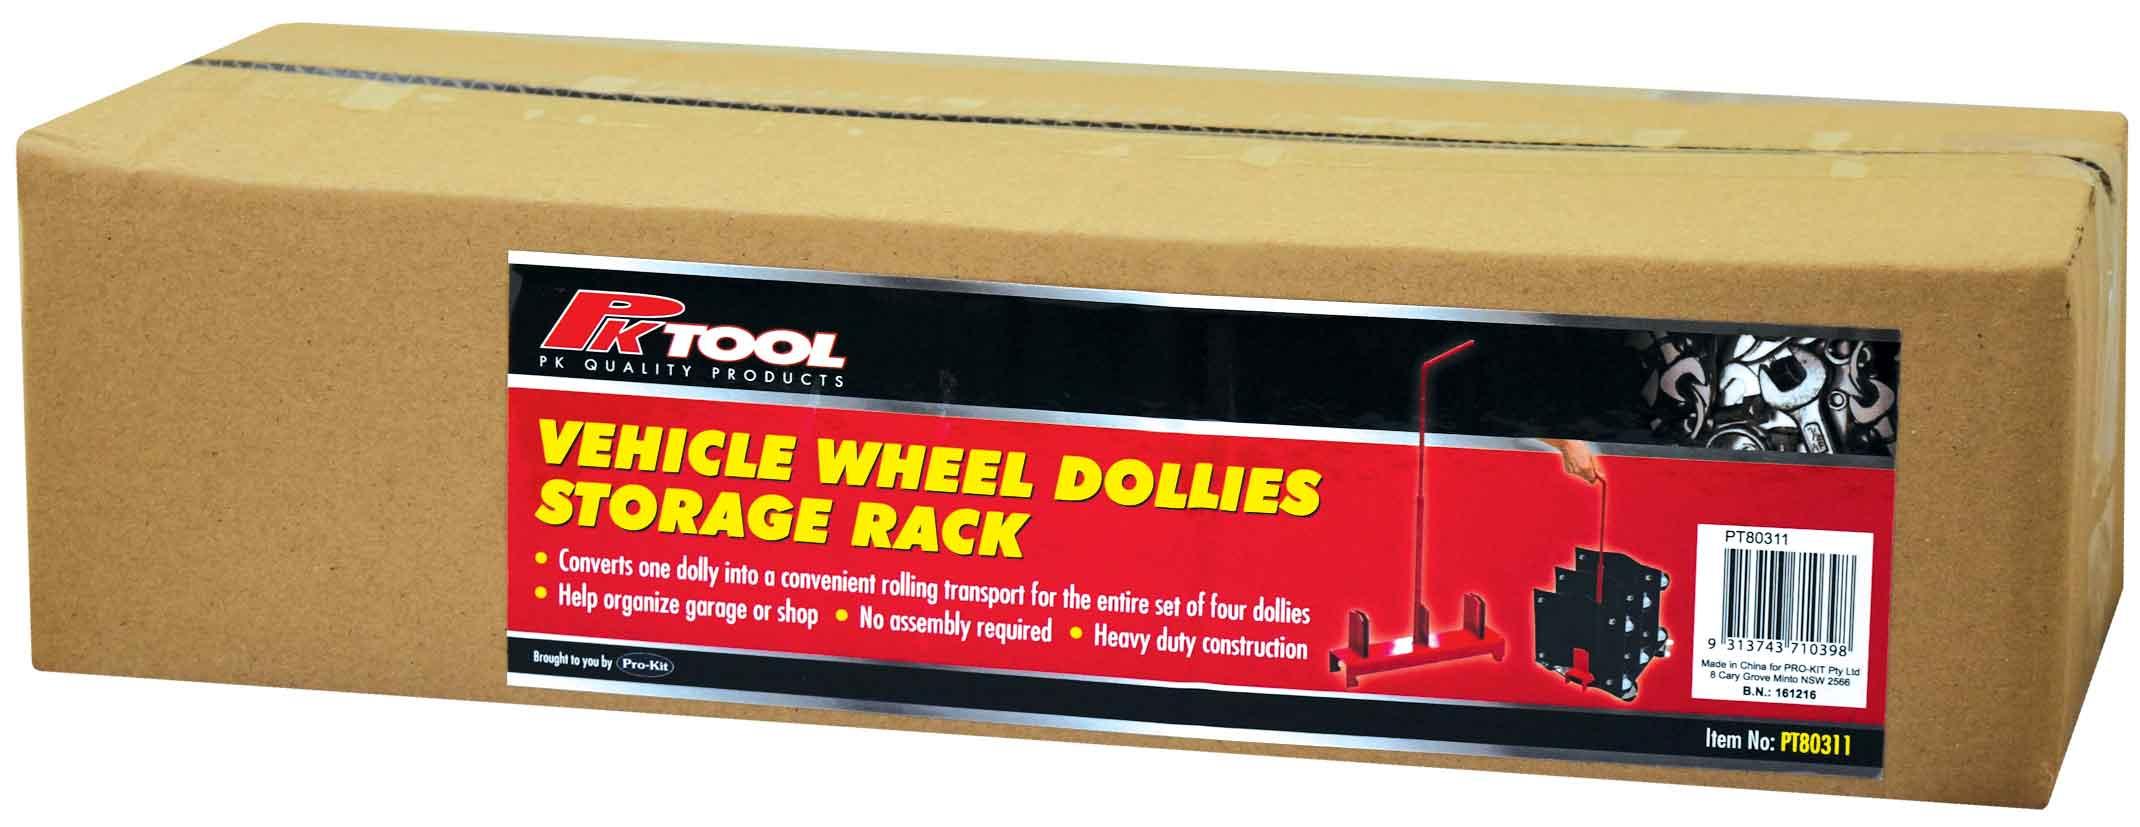 PT80311 Vehicle Wheel Dollies Strorage/Transport Rack image 4